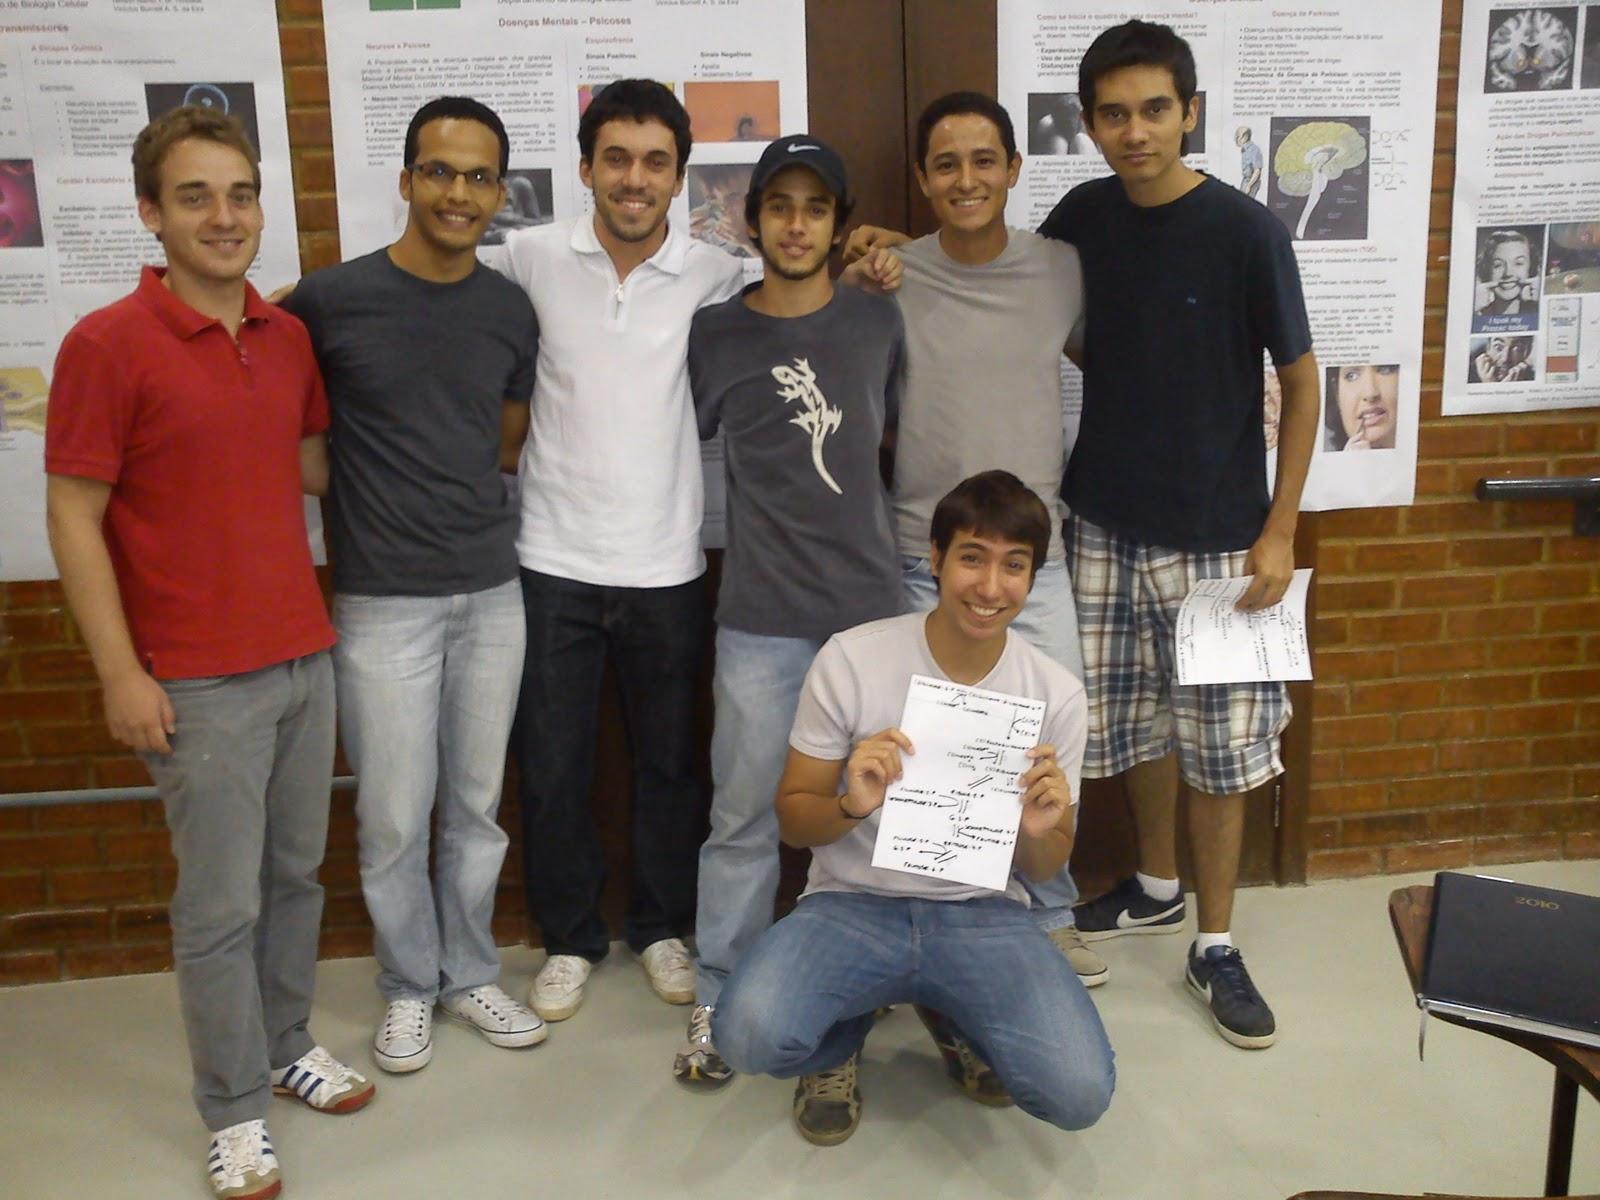 Grupo Neurotransmissores 2010-2